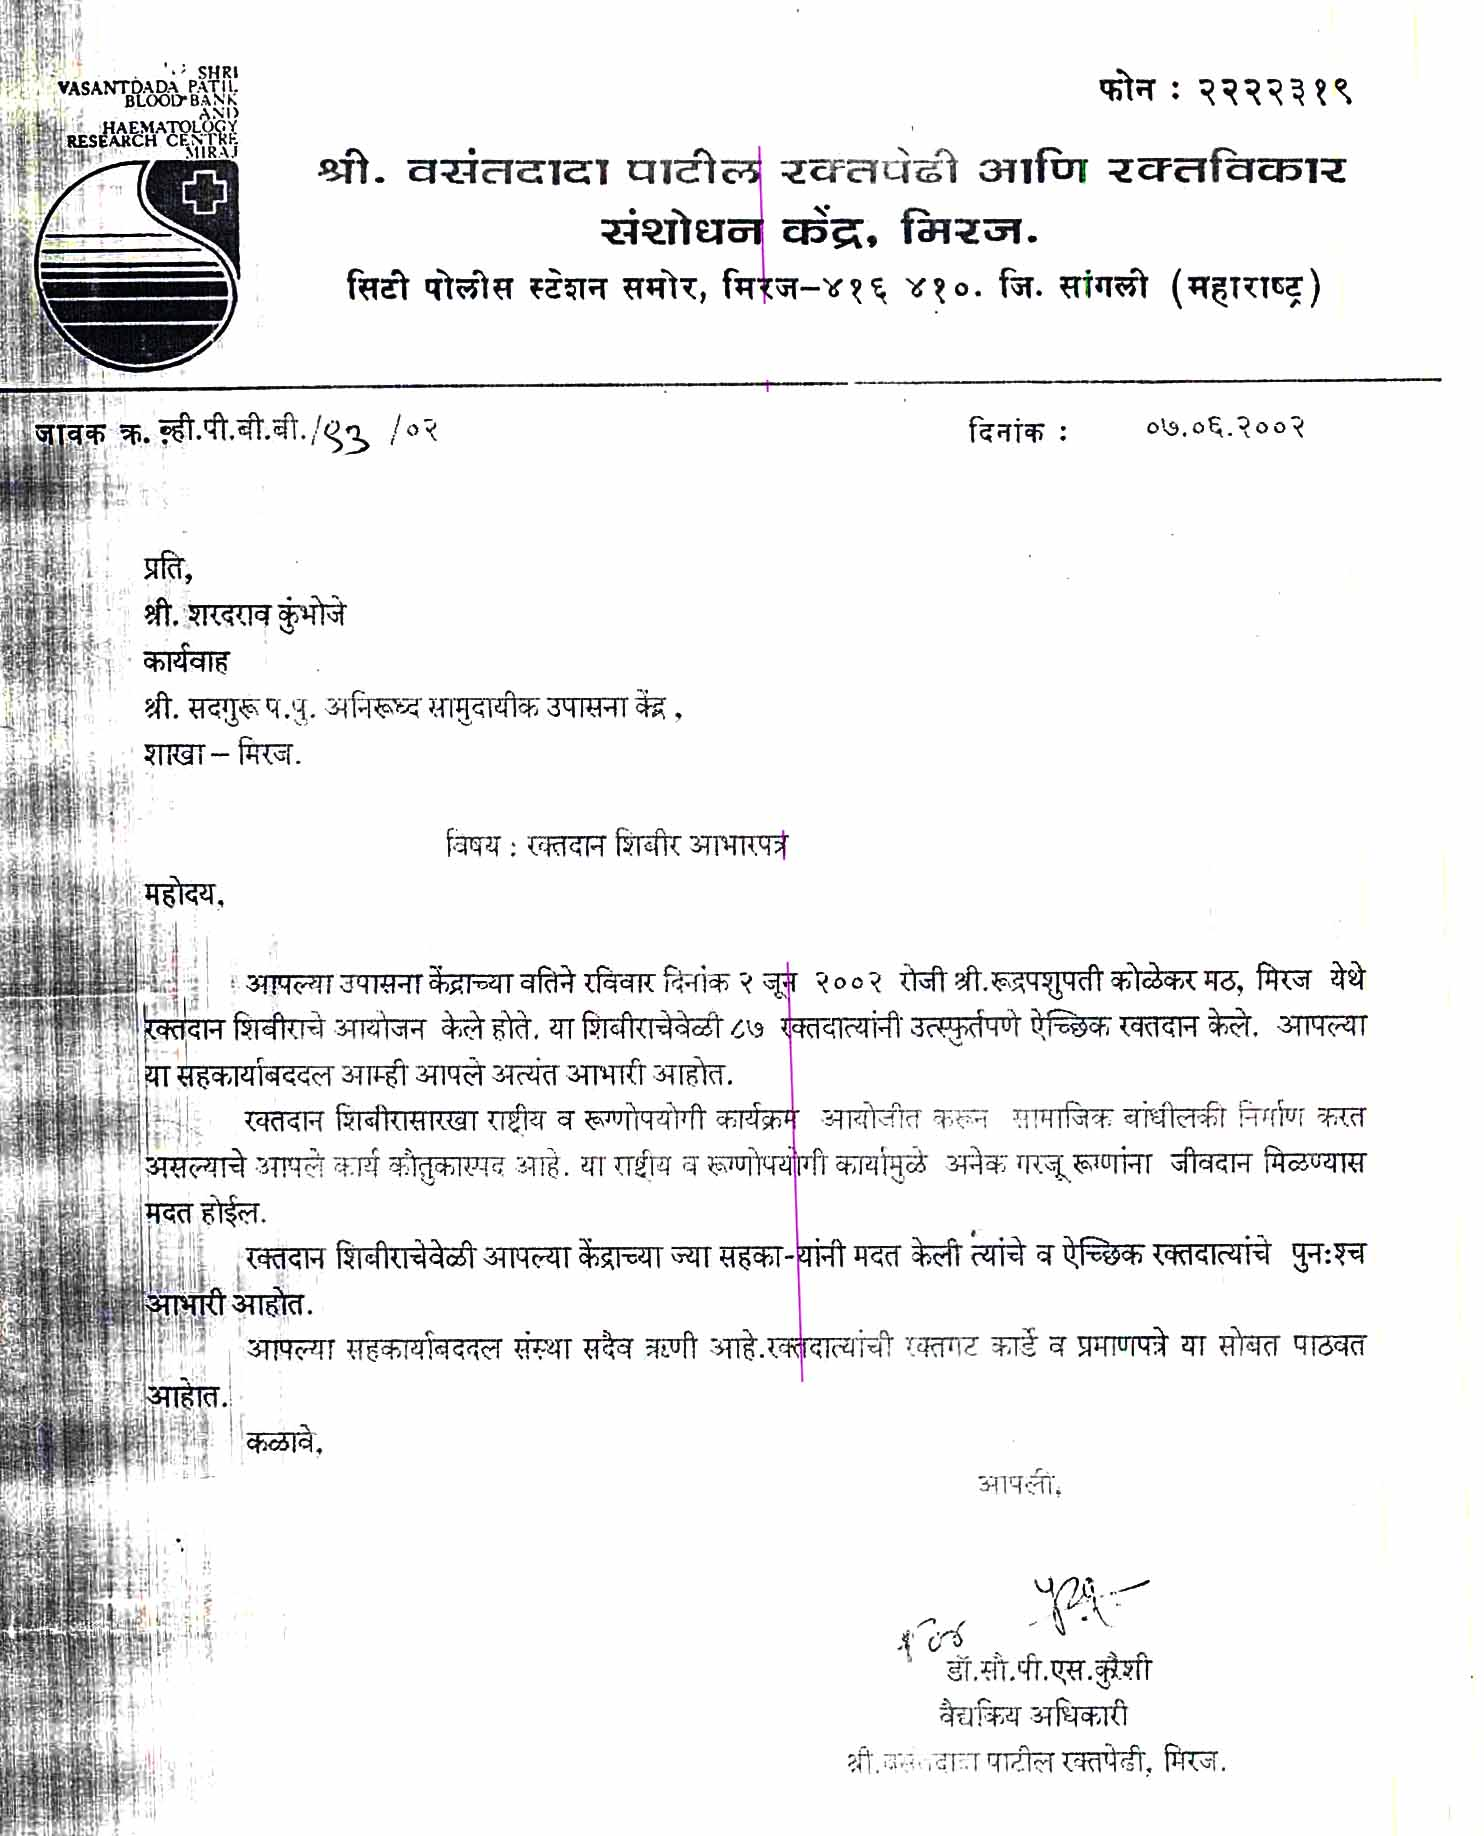 Shree Aniruddha Upasana Foundation Appreciation Letter Blood